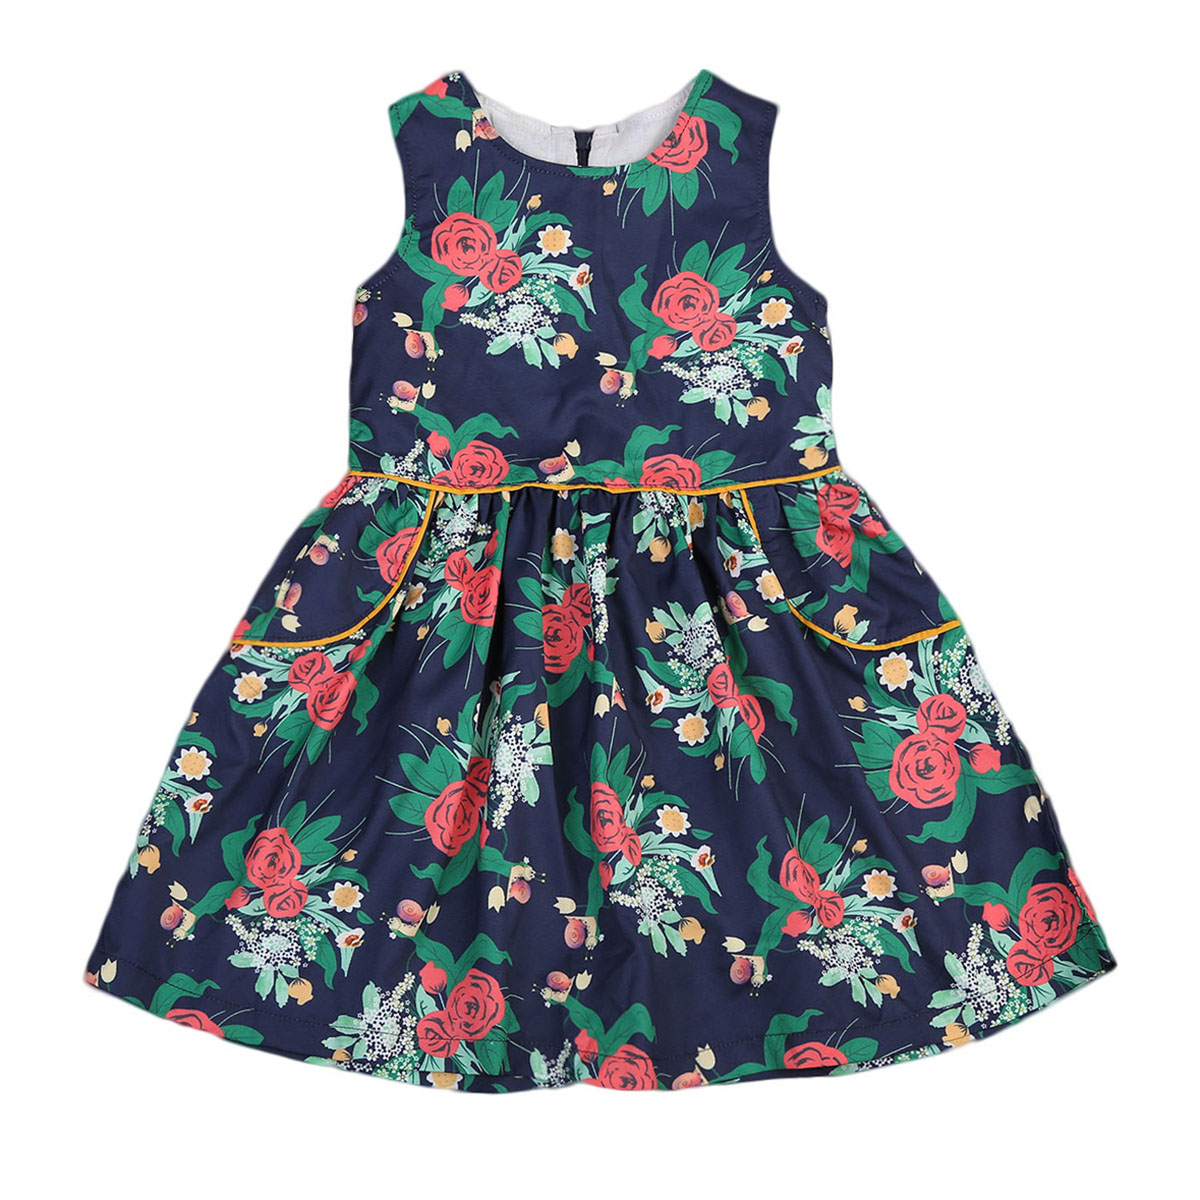 Toddler Kids Baby Girls Summer Floral Dress Sleeveless Flower Cute Tutu Princess Party Pageant Dresses Girl